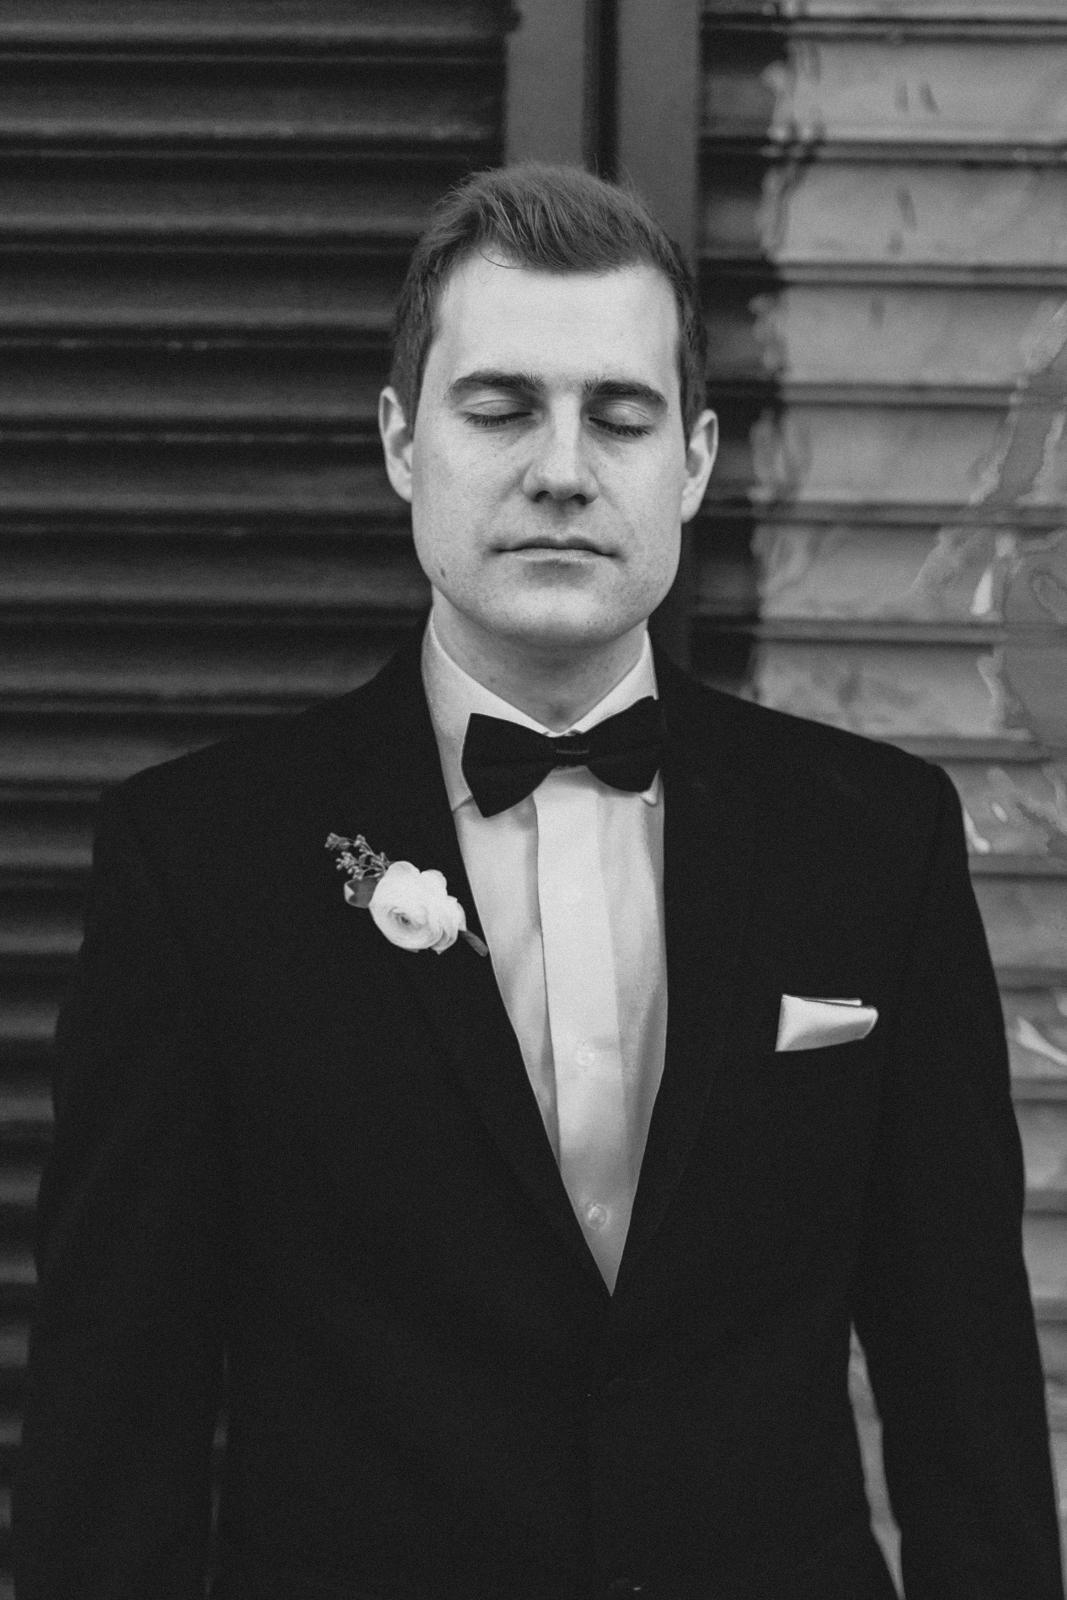 NYC Wedding Photography Lofts at Prince Brooklyn NYC Photographer Boris Zaretsky _B2C0612.jpg